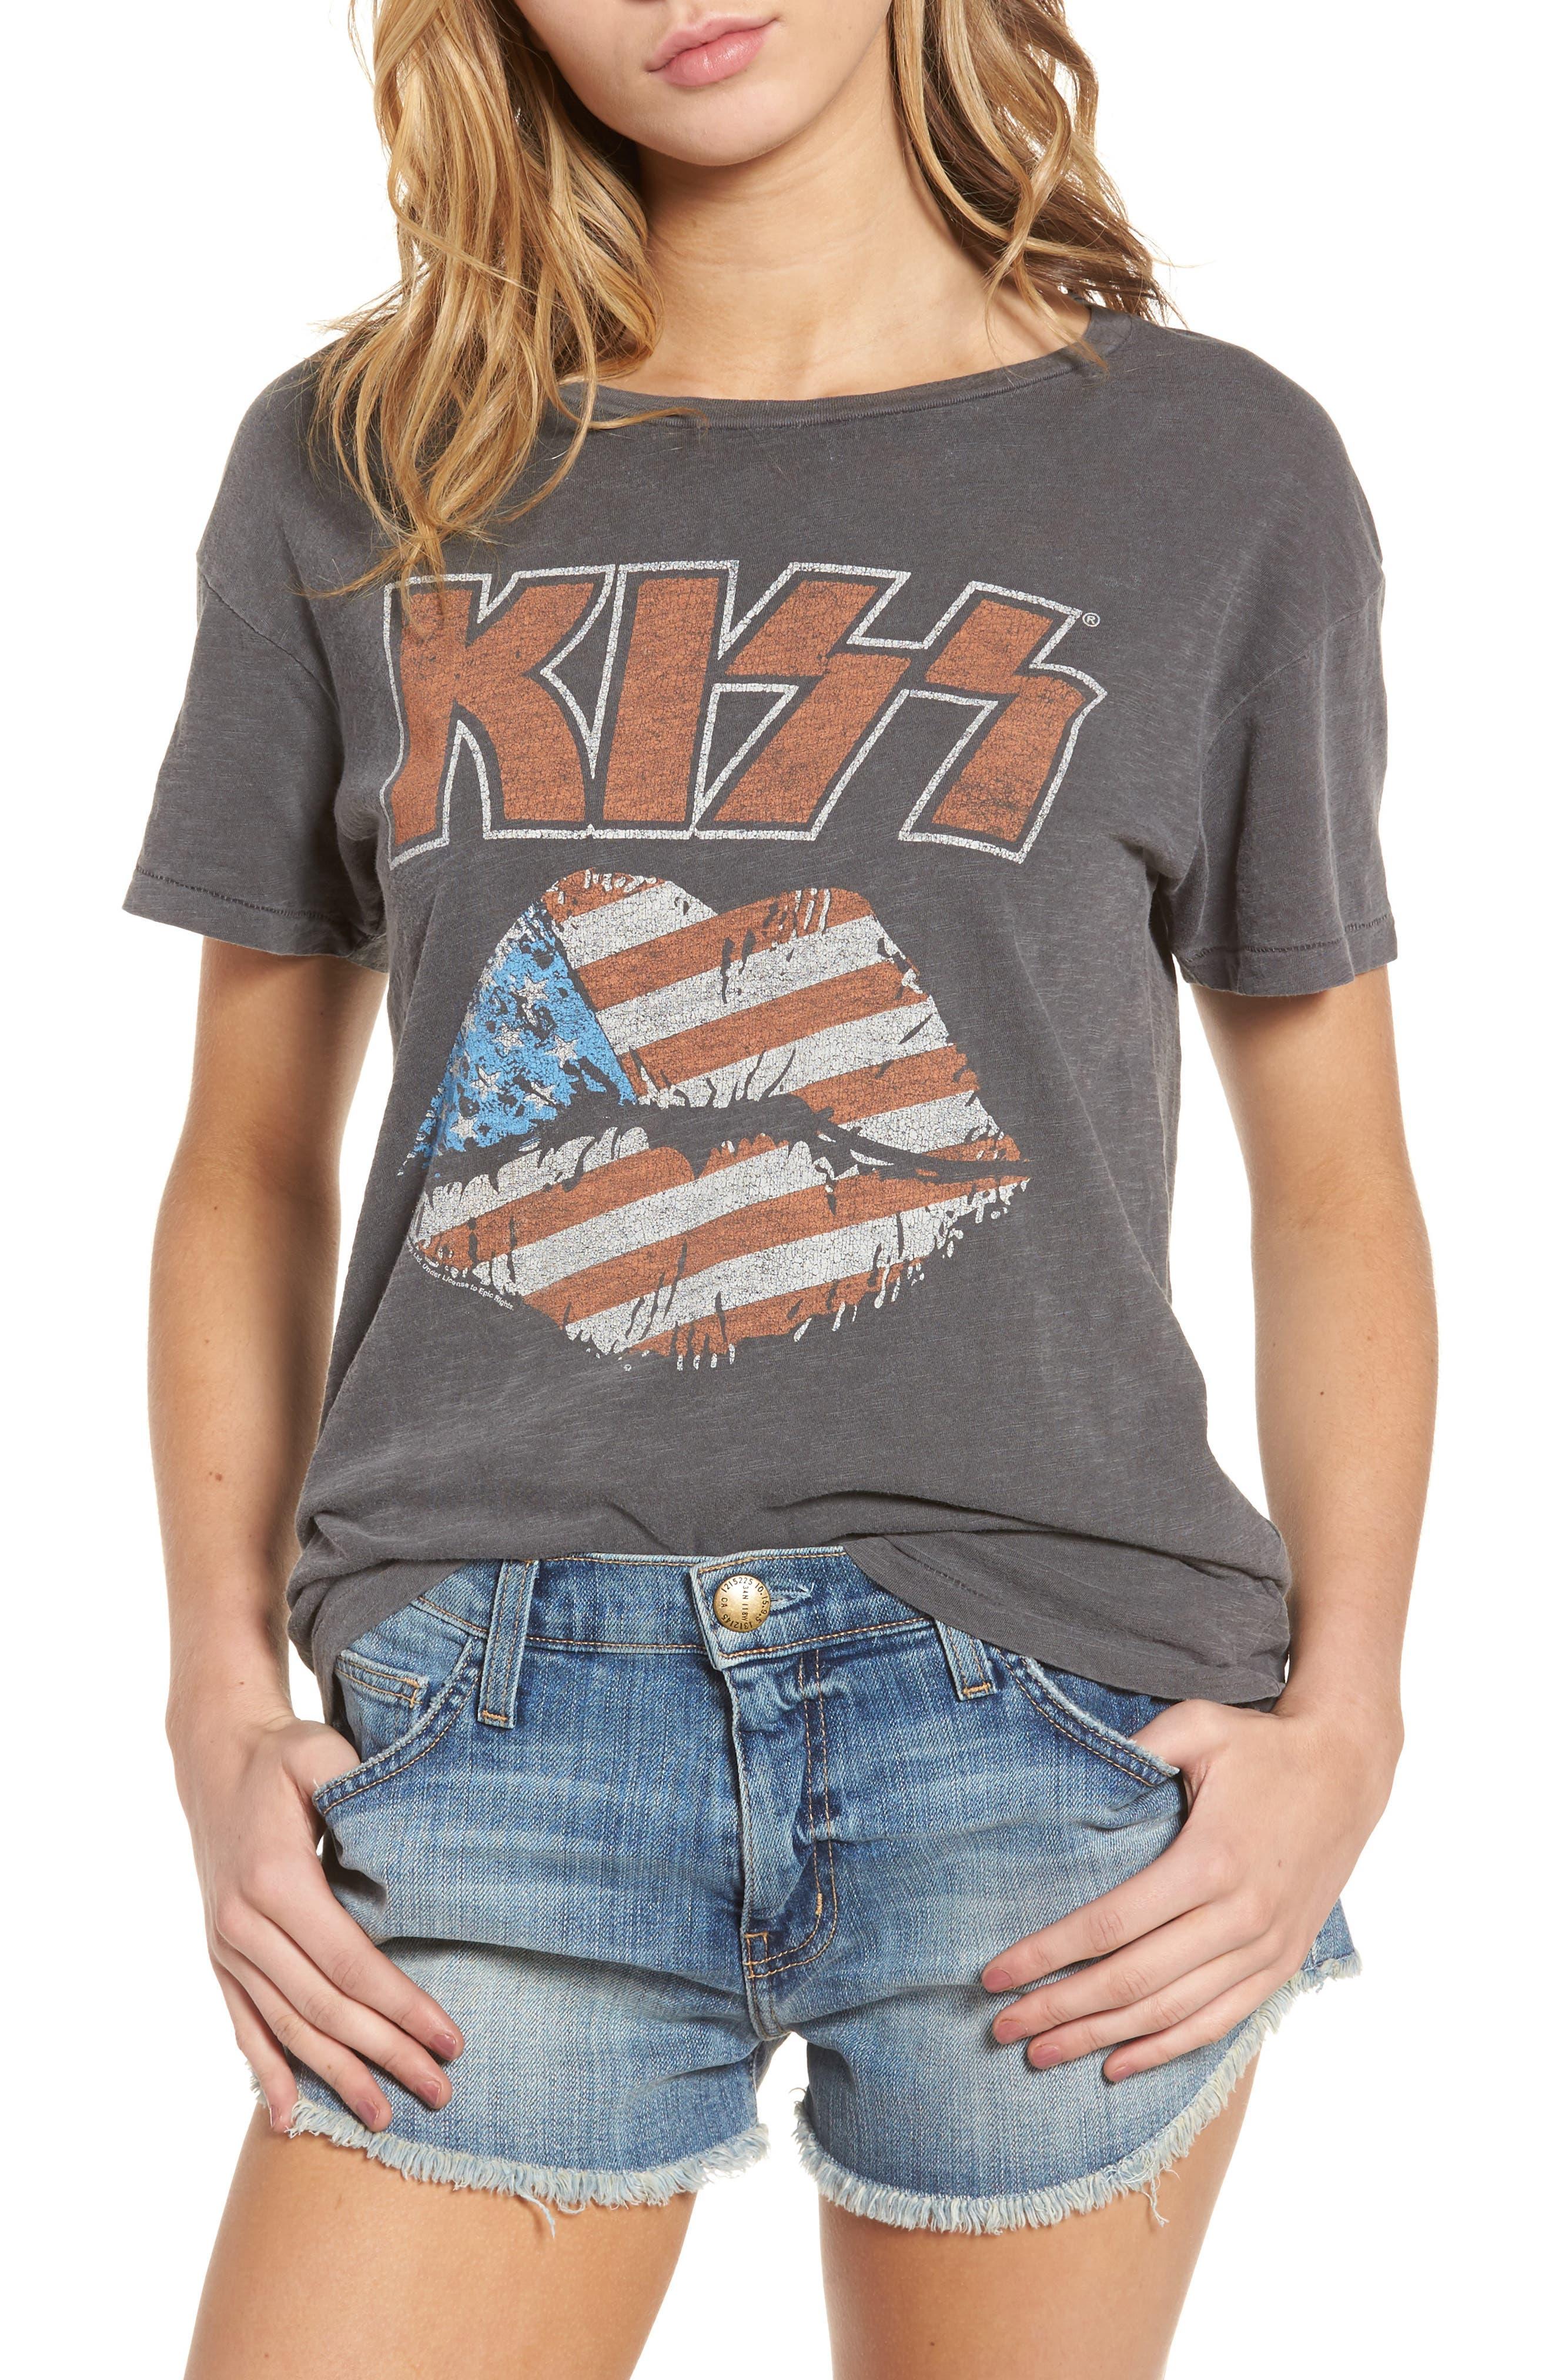 Junkfood KISS Concert Tee